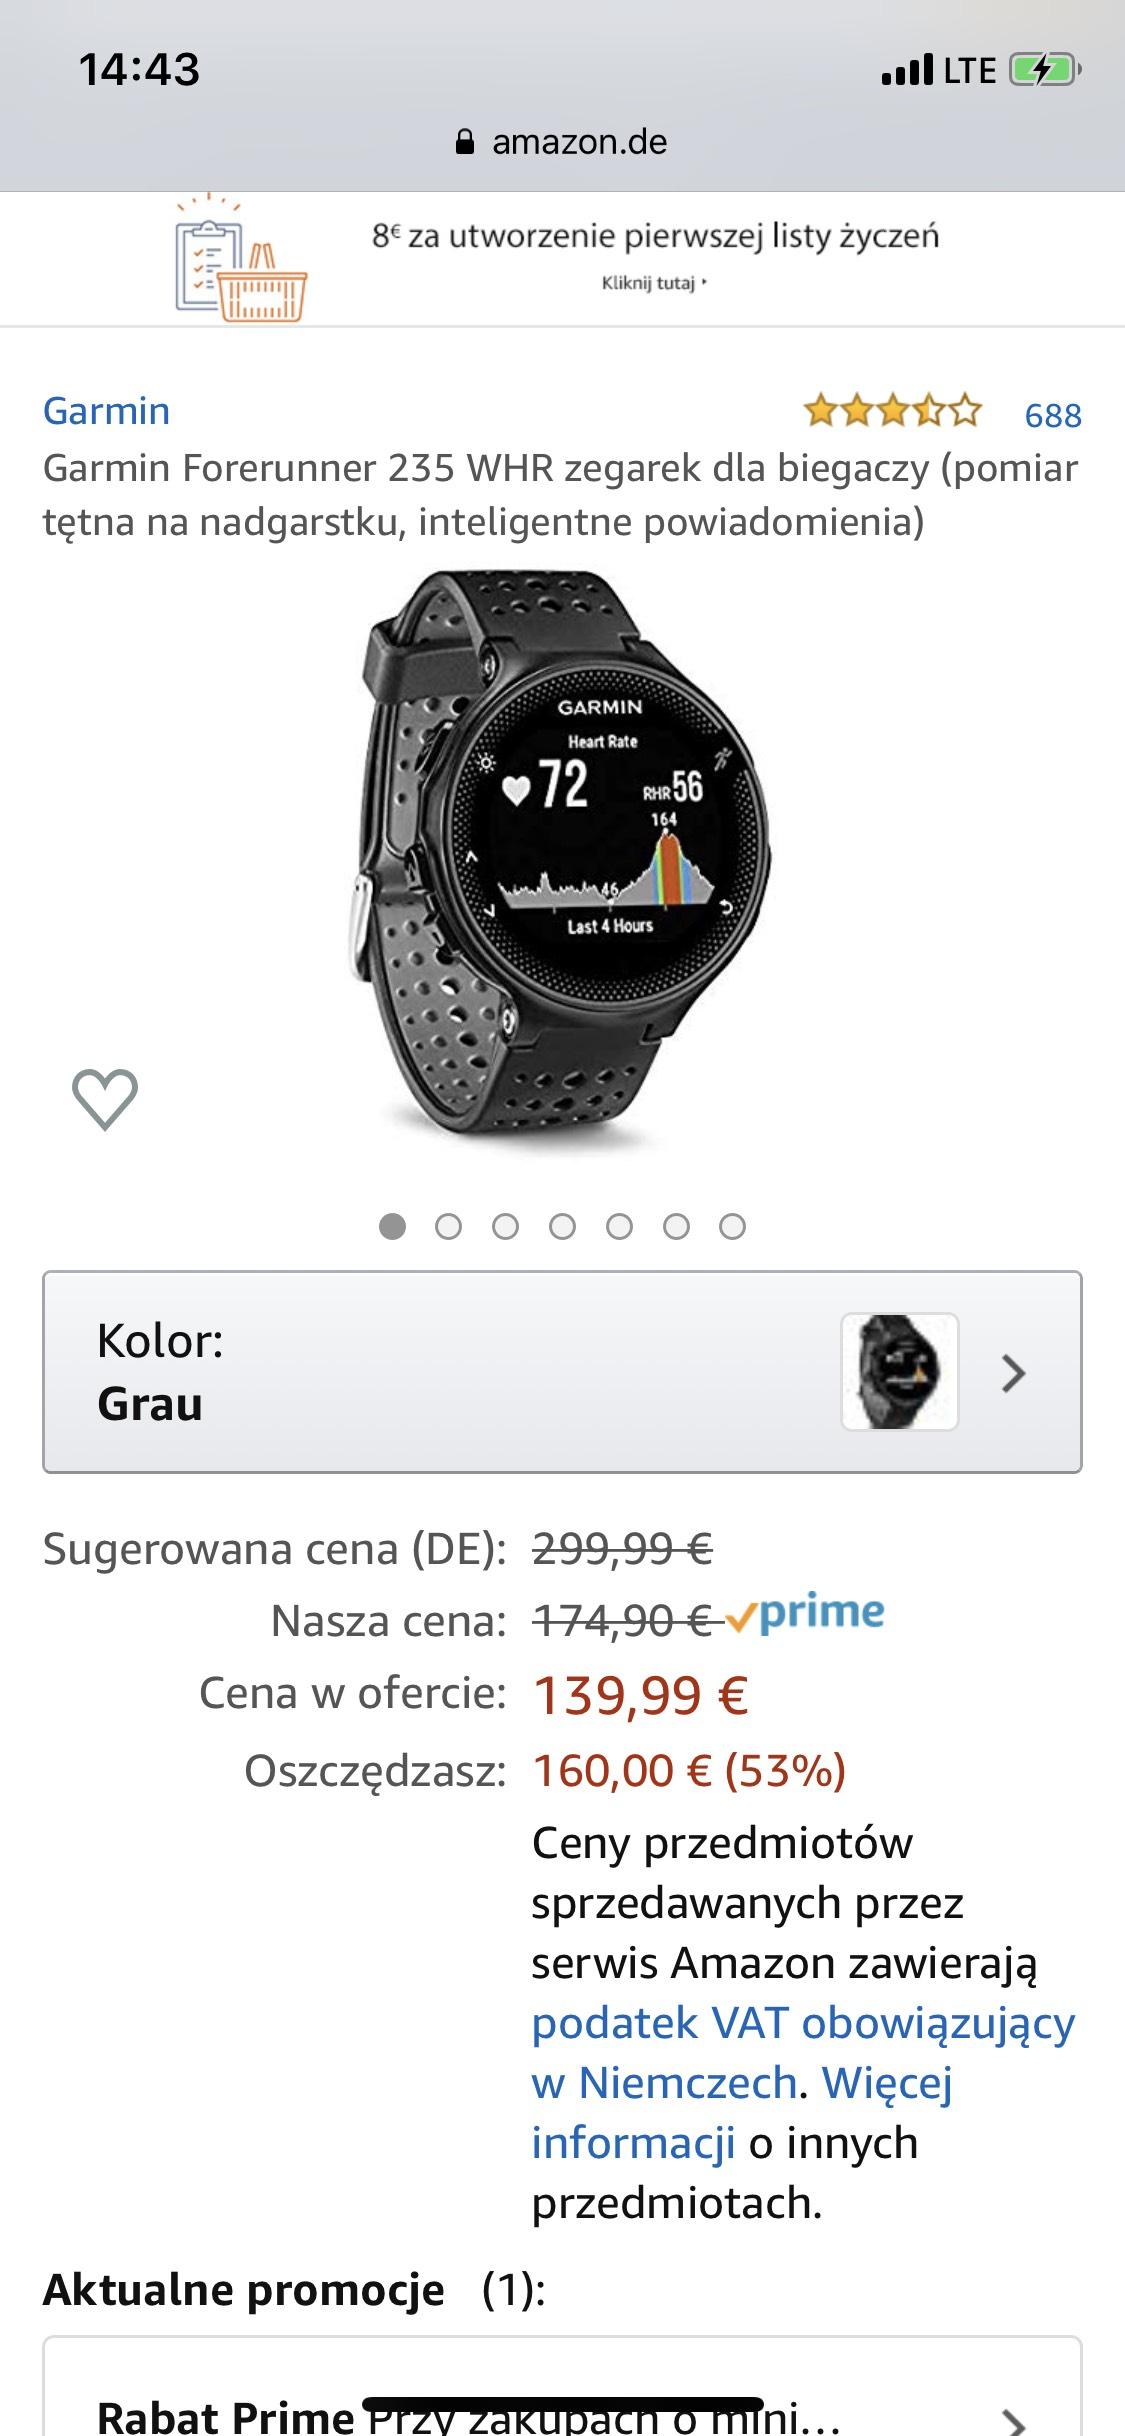 Garmin Forerunner 235 WHR zegarek dla biegaczy